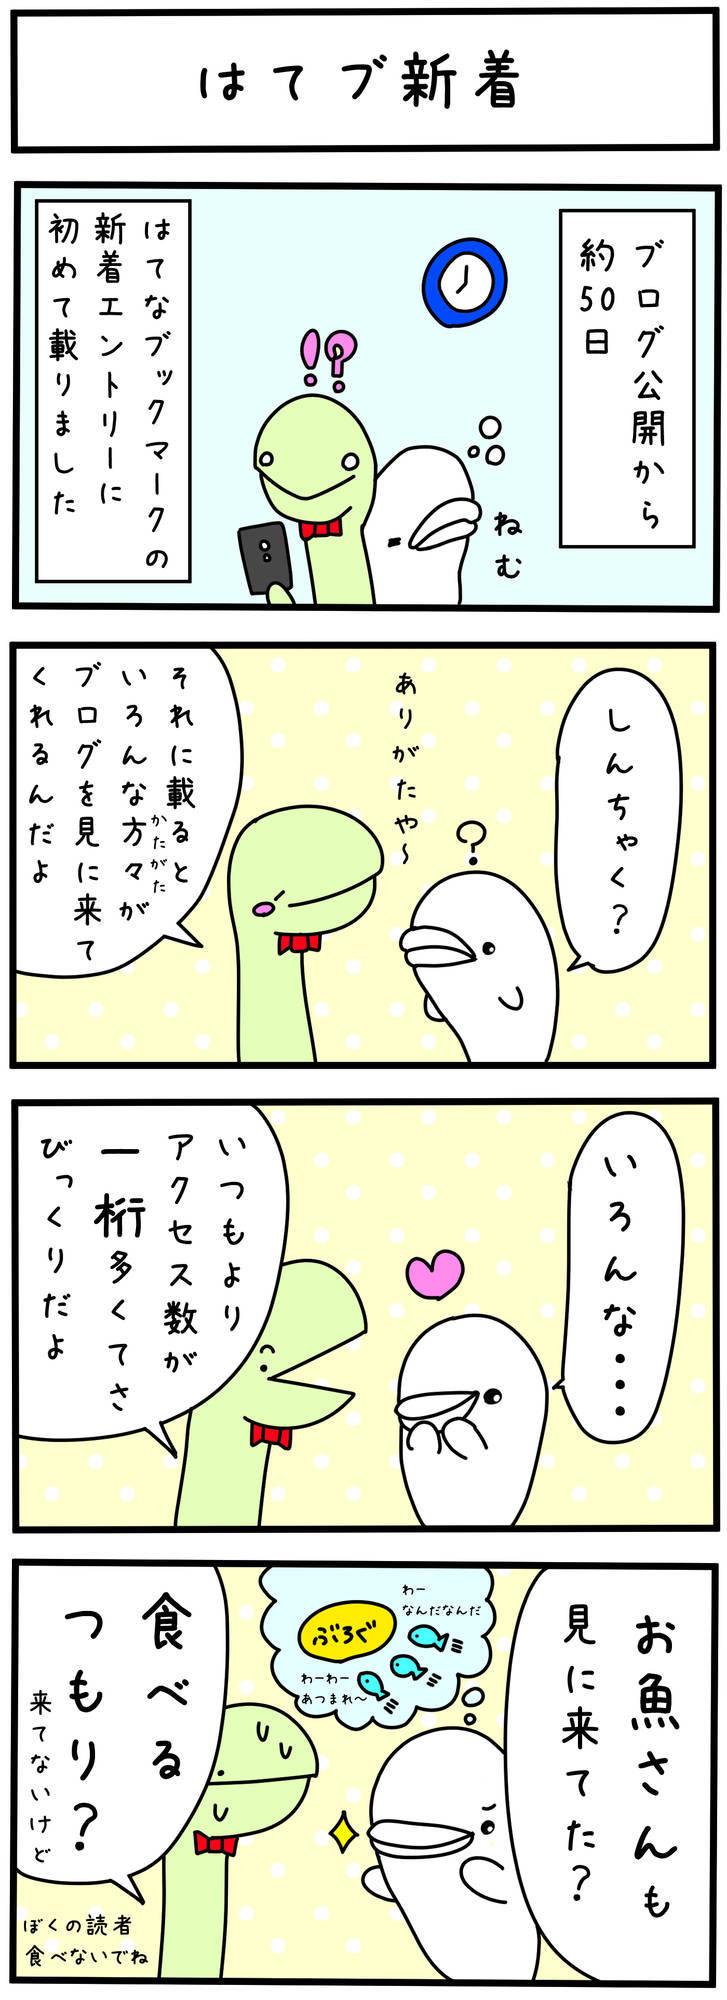 f:id:shiro_iruka:20190423232340j:plain